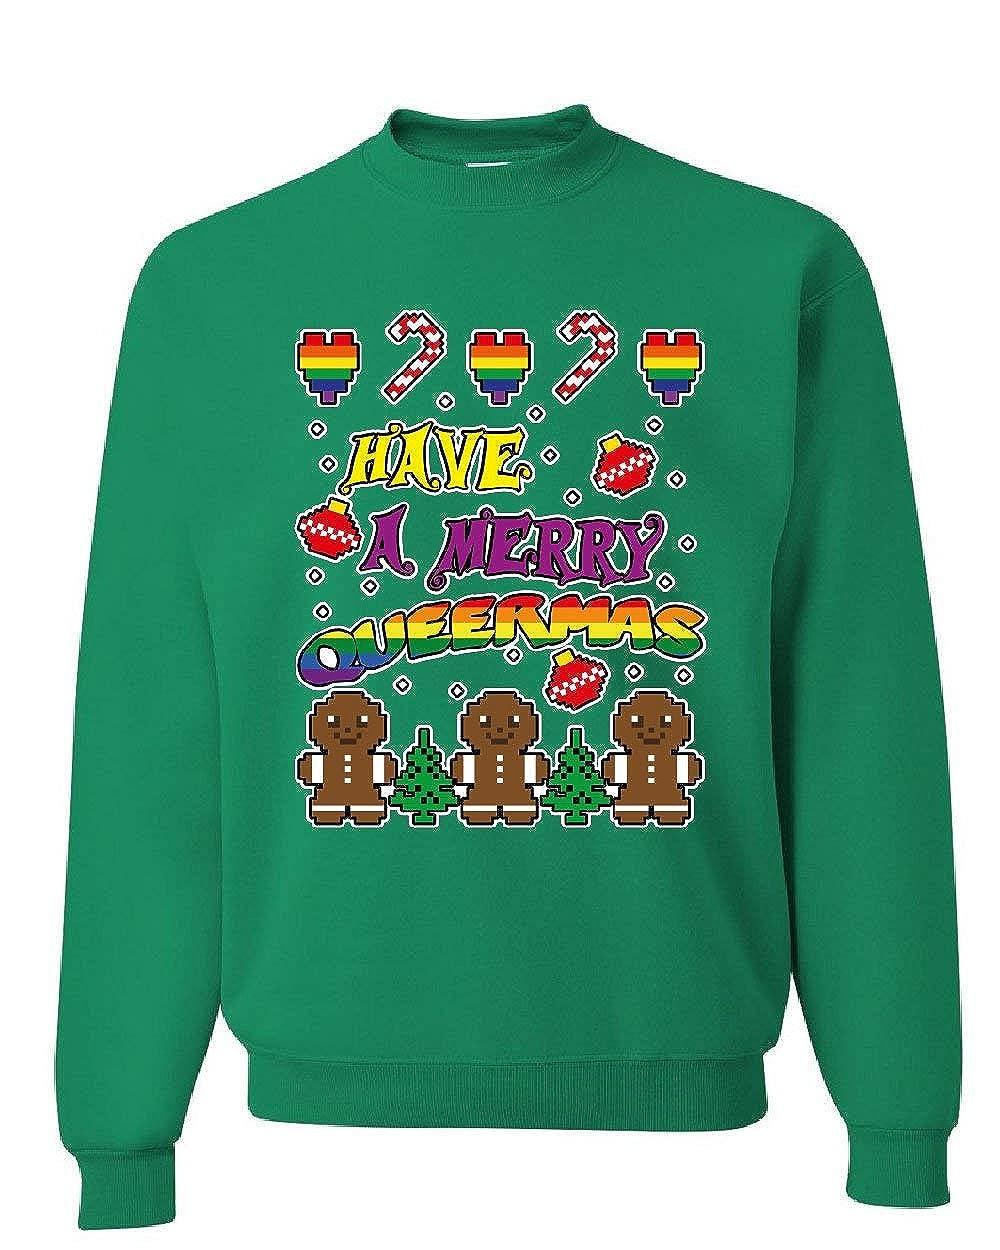 Tee Hunt Have a Merry Queermas Sweatshirt Ugly Sweater Christmas LGBT Xmas Sweater